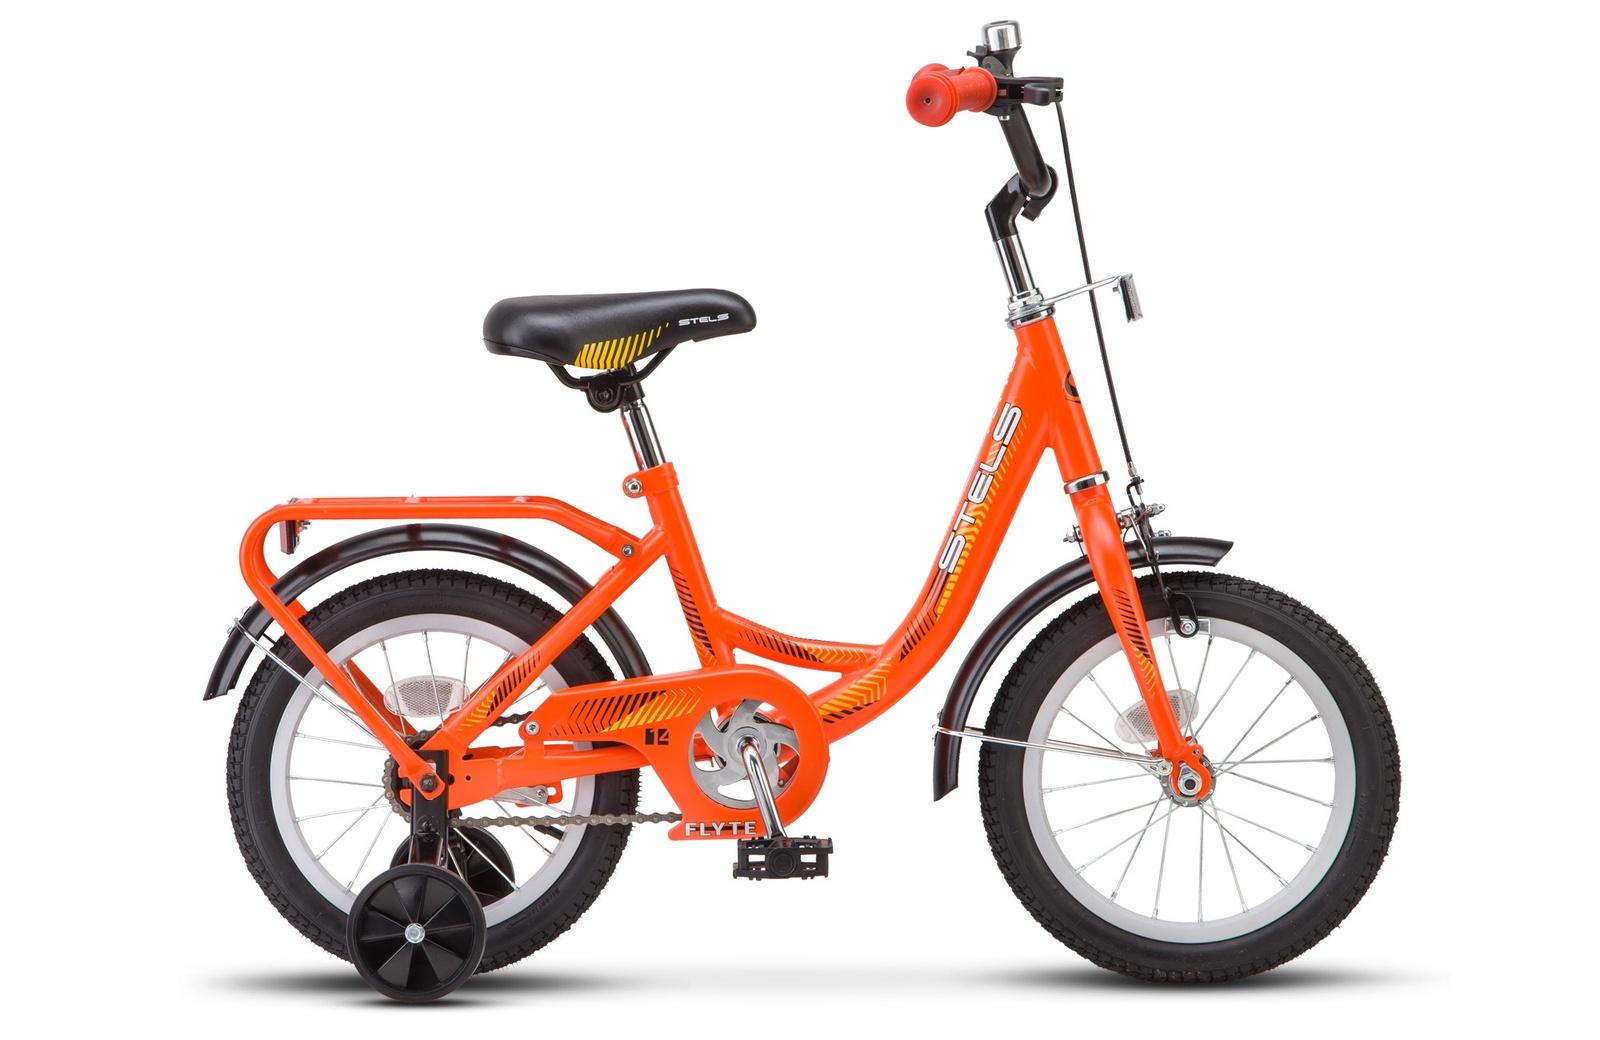 Велосипед STELS Flyte 14 (Z011), красный